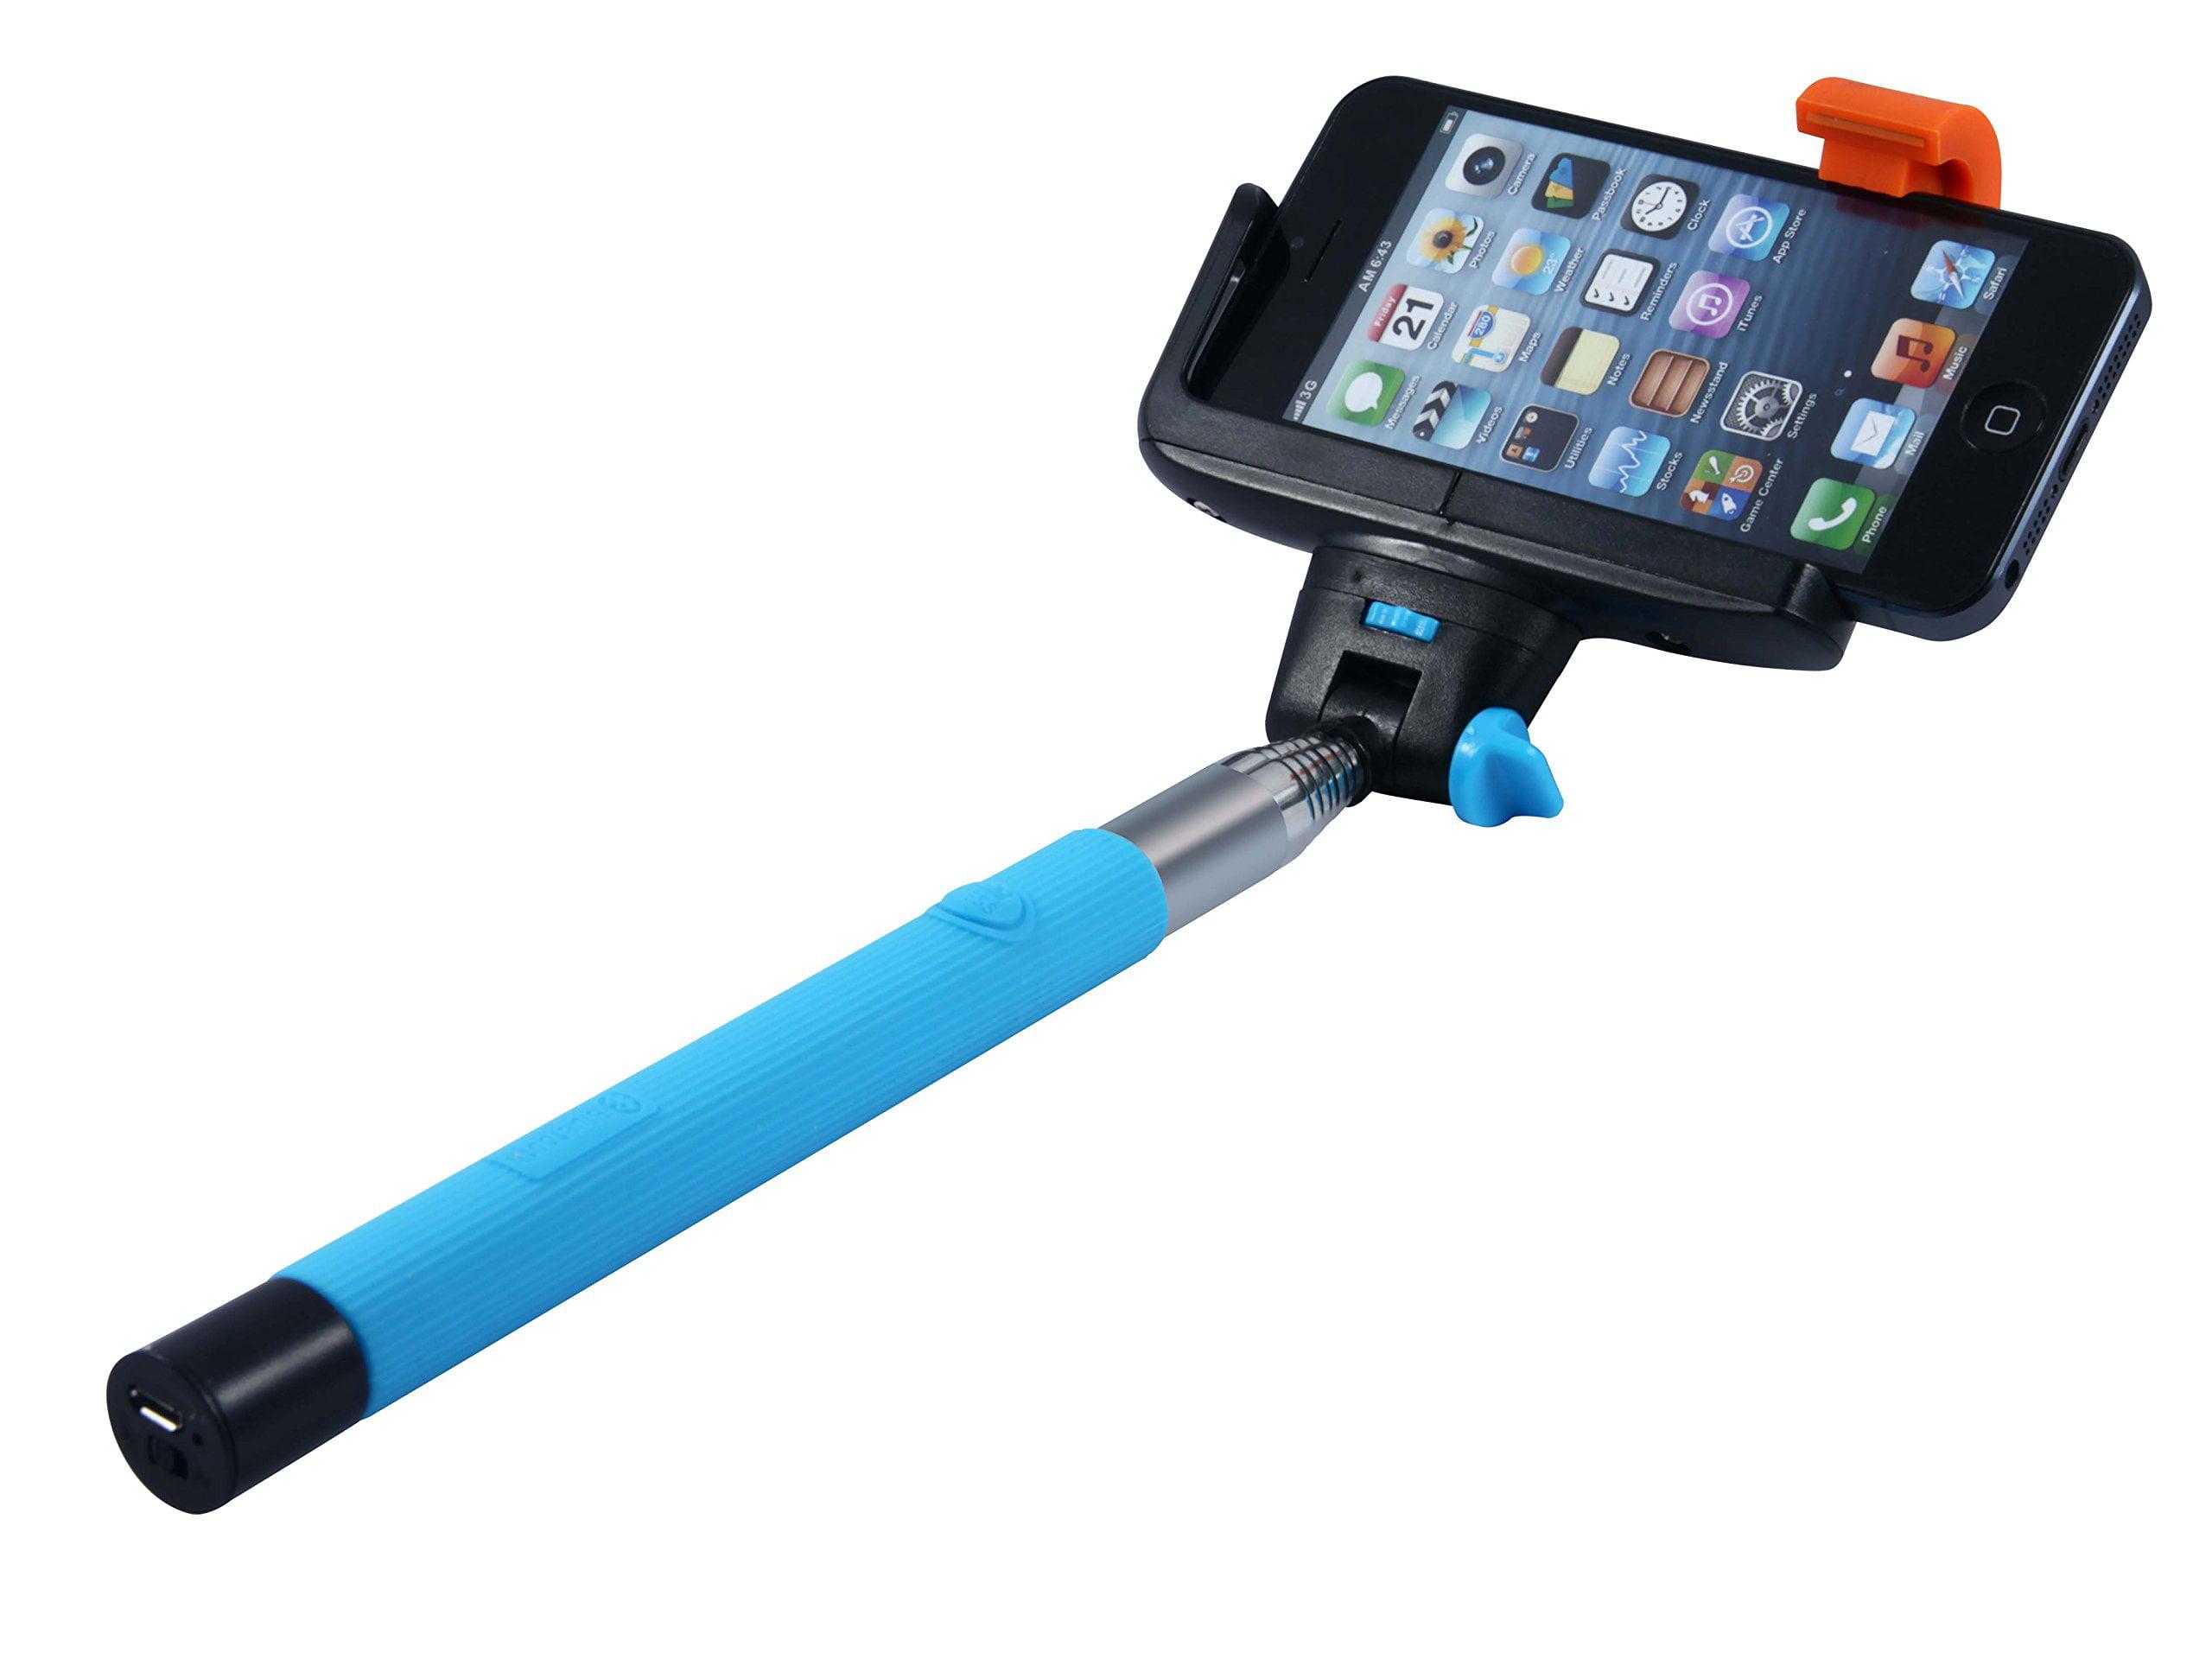 Craig Electronics CMA3319 Craig Cma3319 Selfie Remote Stick With Bluetooth  Wireless